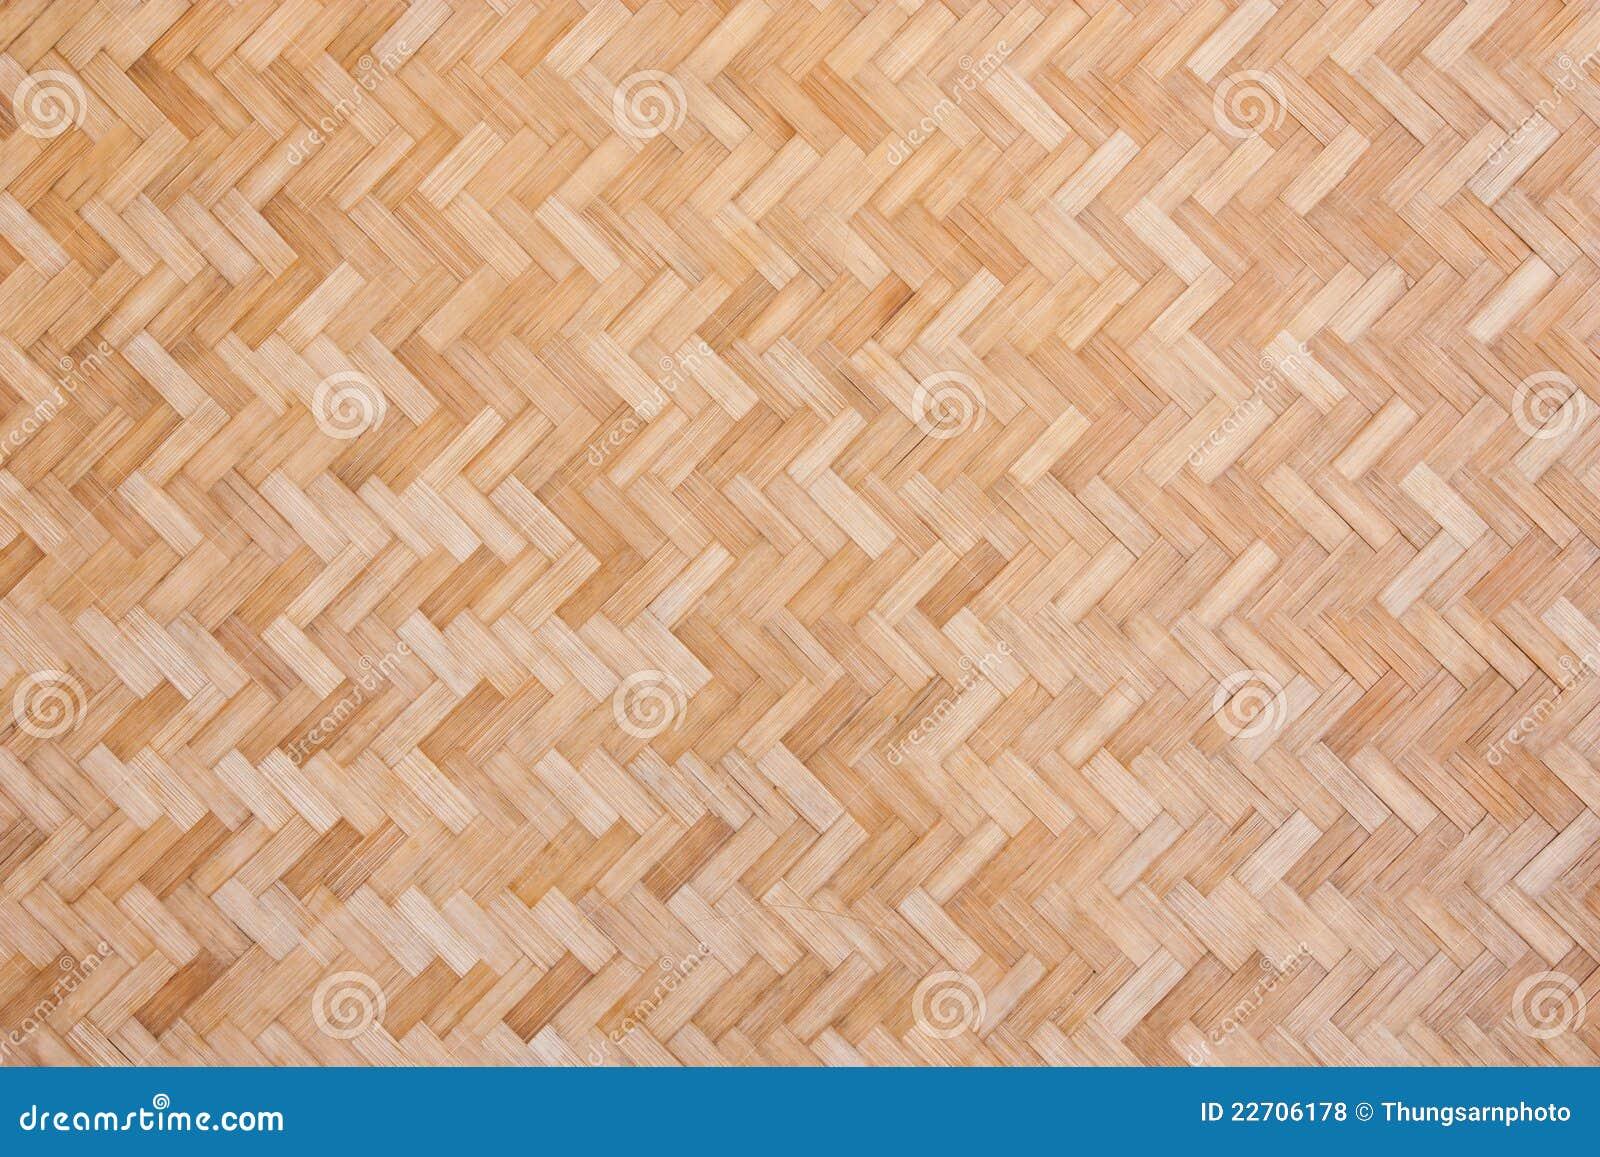 Woven bamboo wall royalty free stock photos image 22706178 - Woven wood wall panels ...